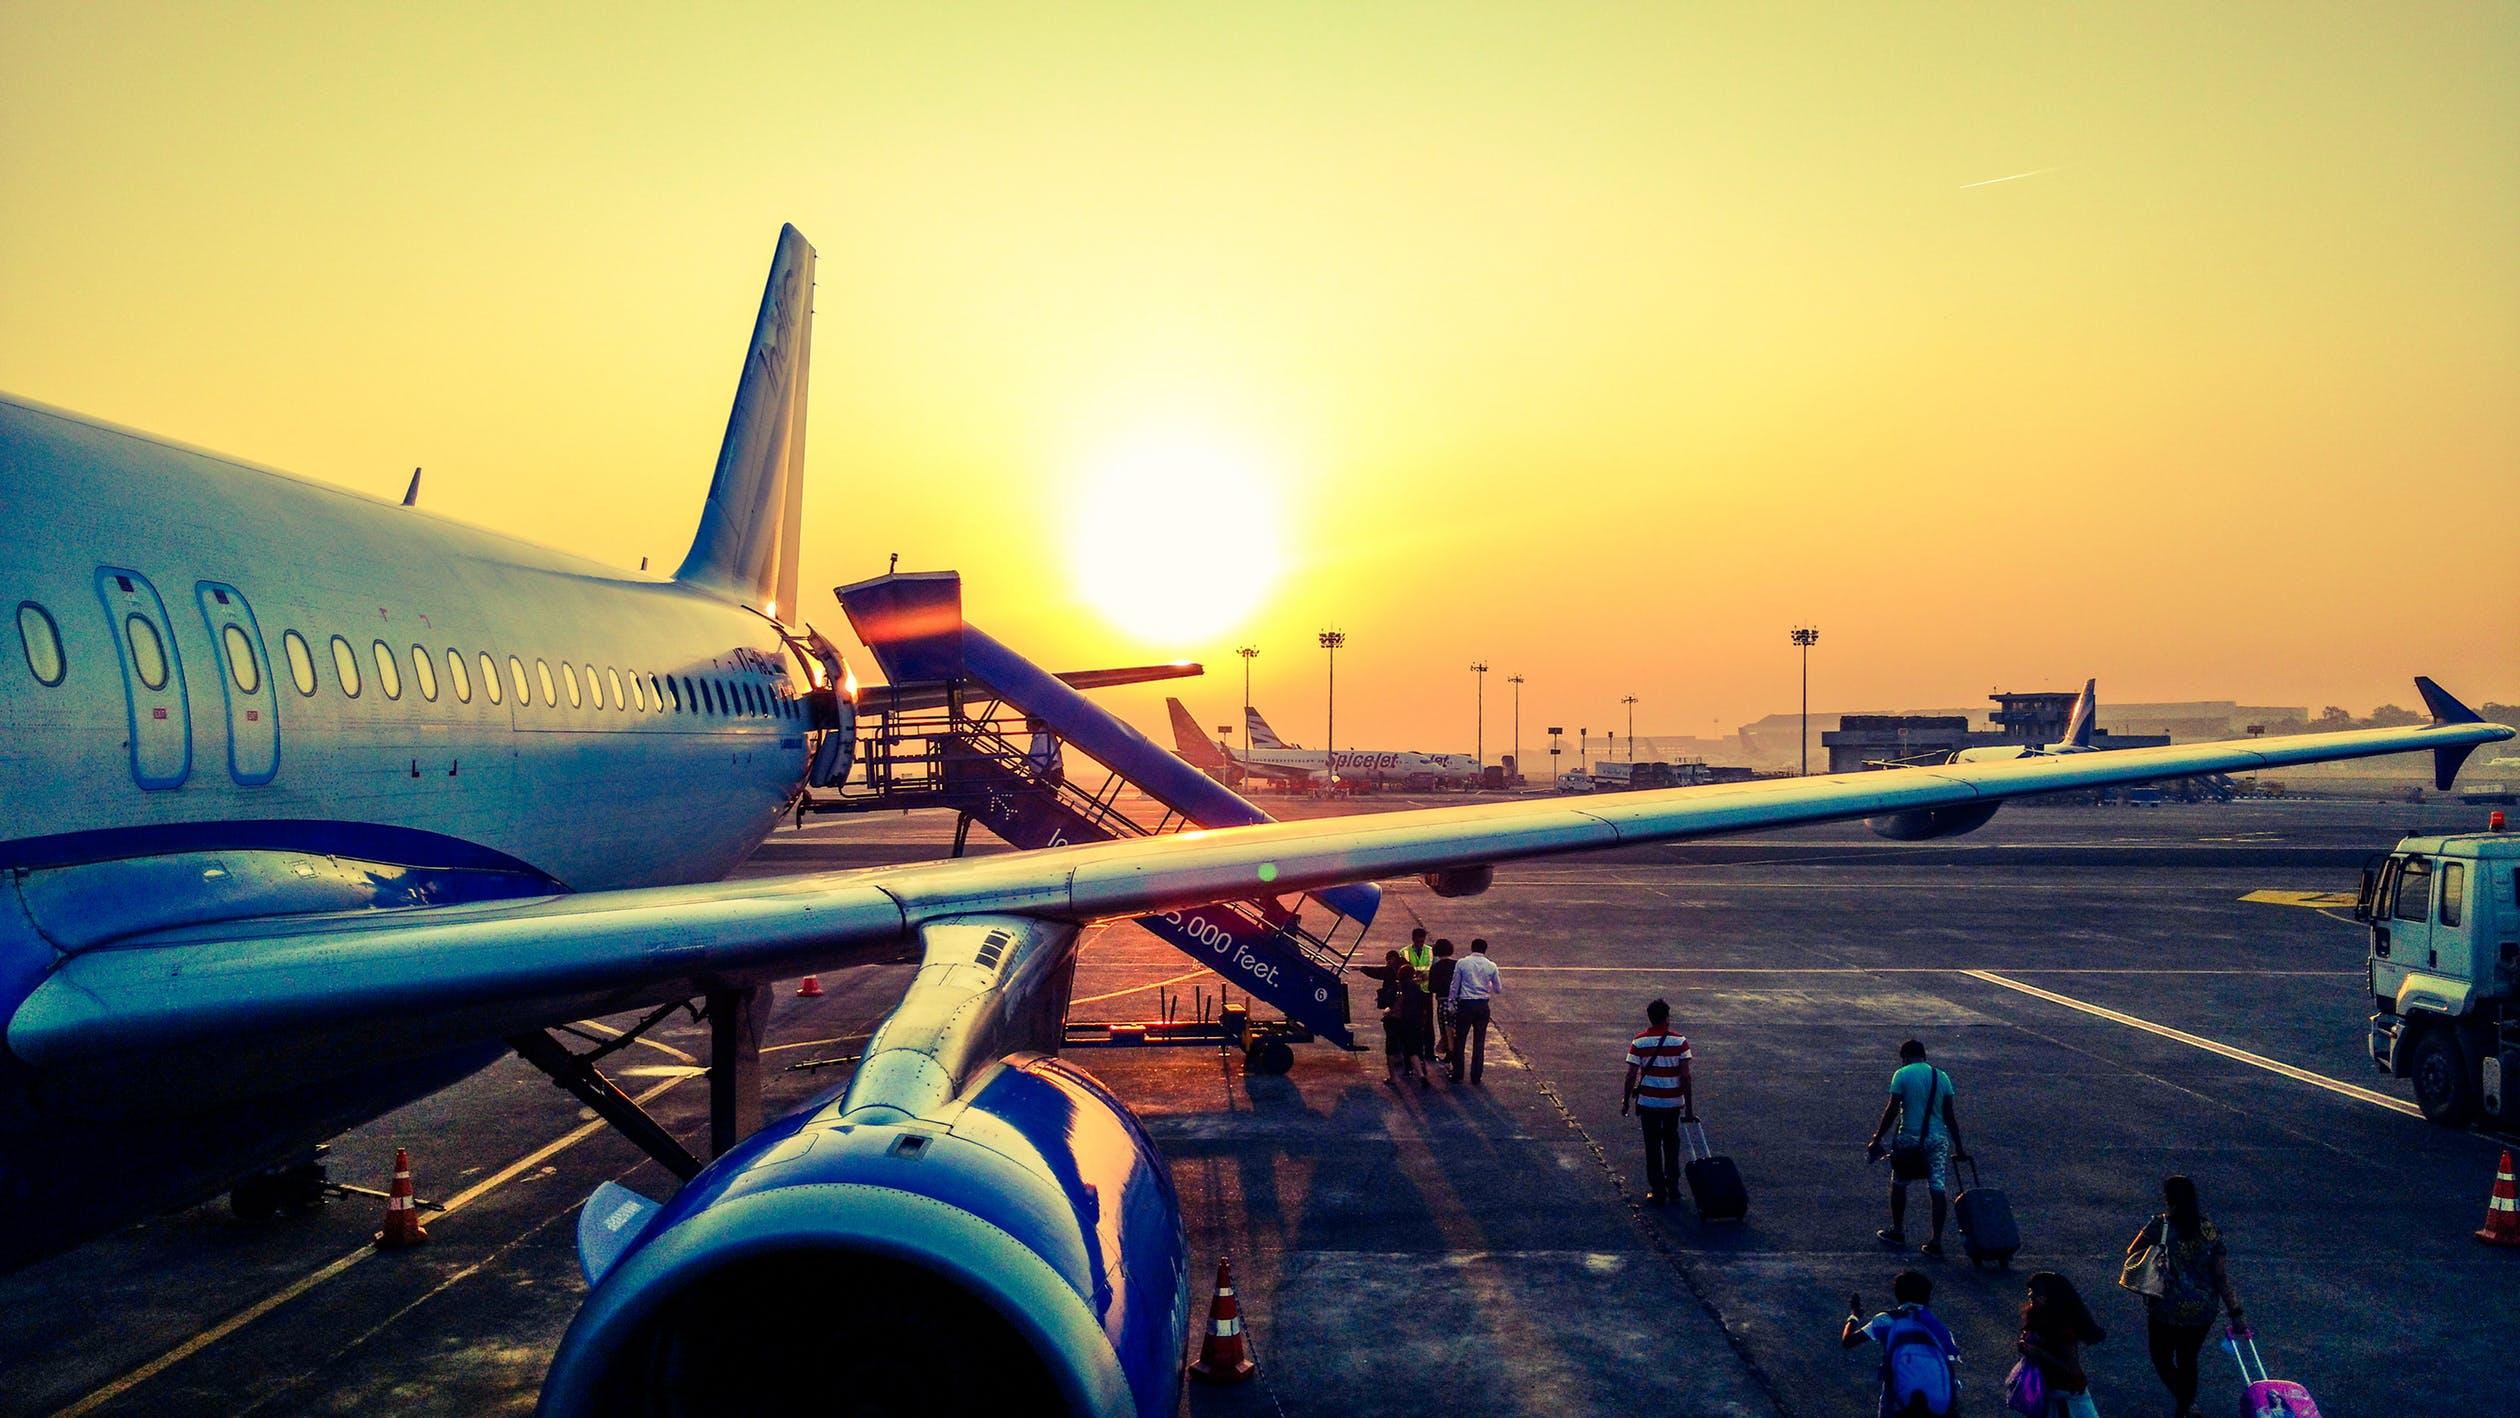 Foto van vliegtuig op vliegveld met op achtergrond zonsondergang.